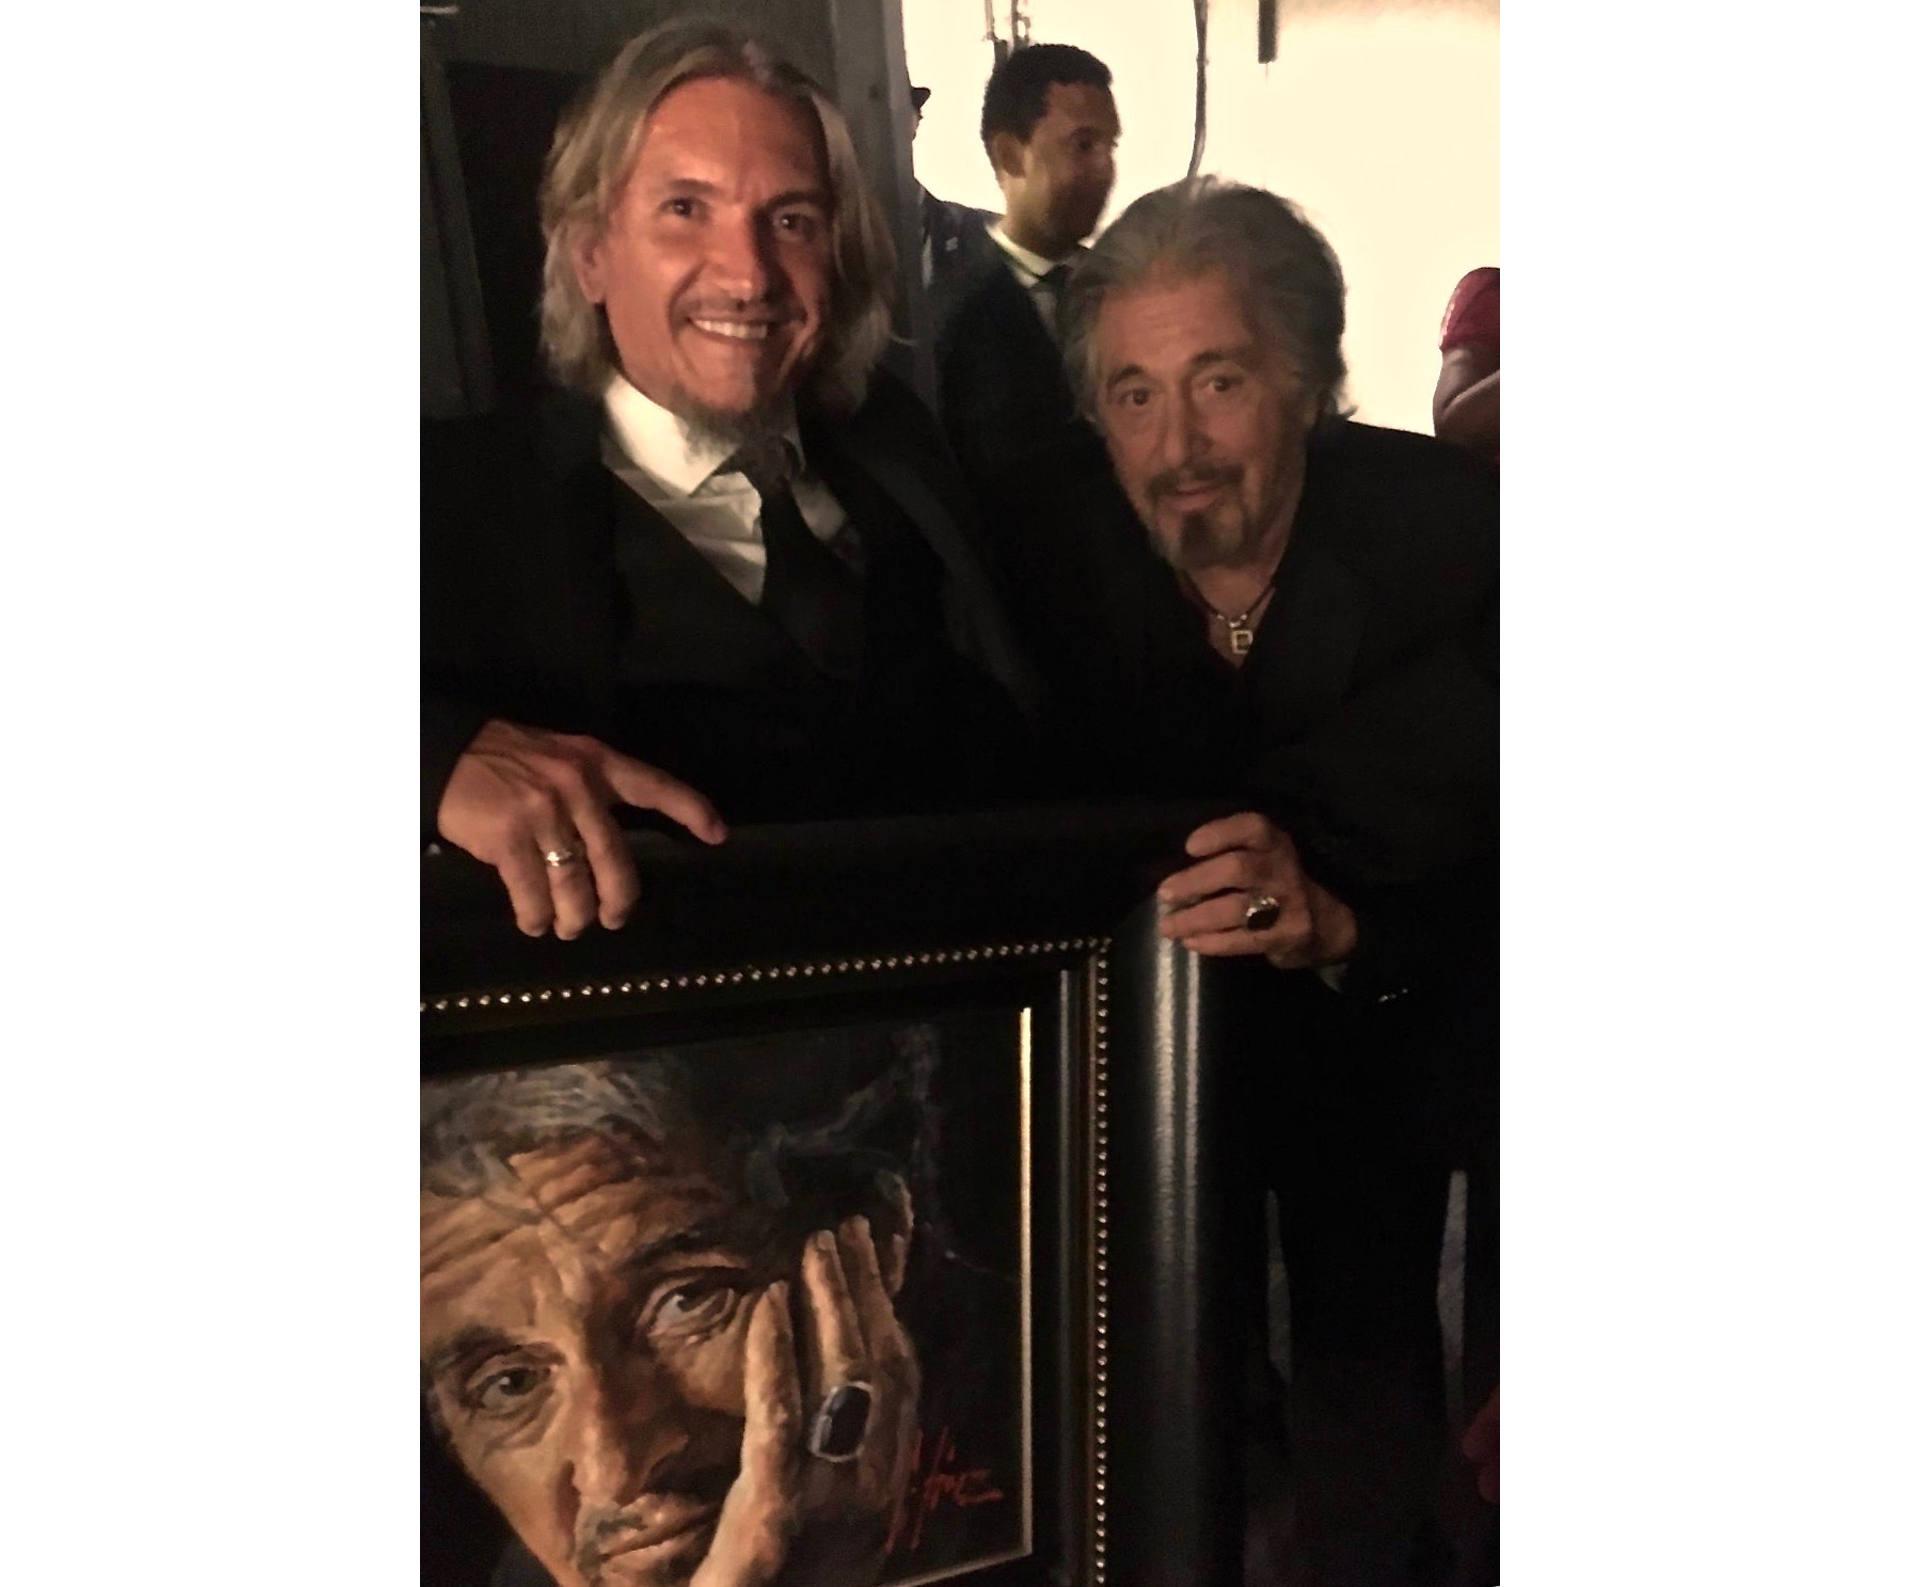 Al Pacino standing next to Fabian Perez holding portrait